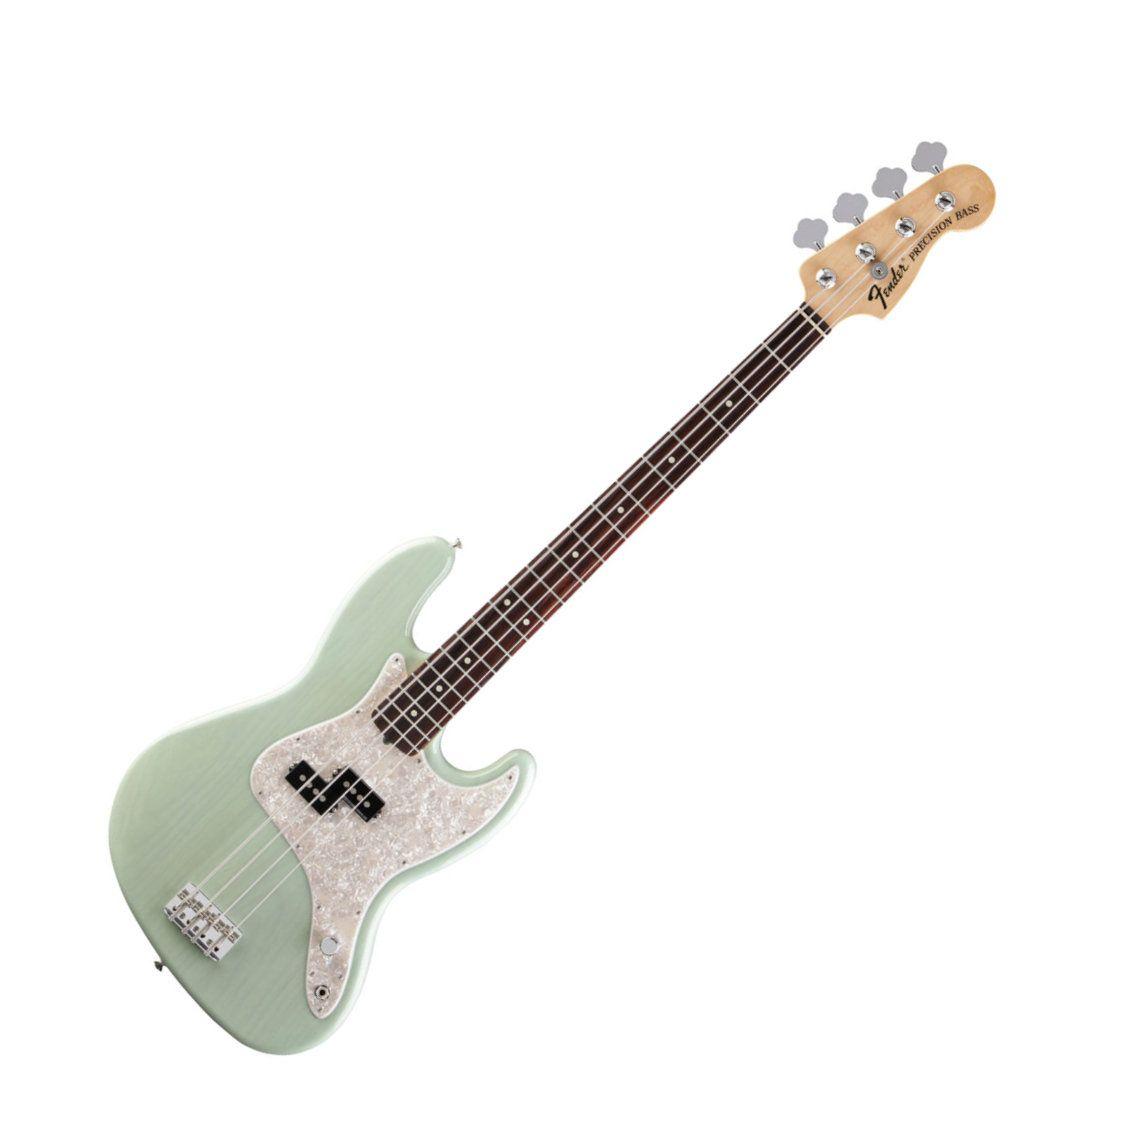 Fender Mark Hoppus Bass In Surf Green Transparent